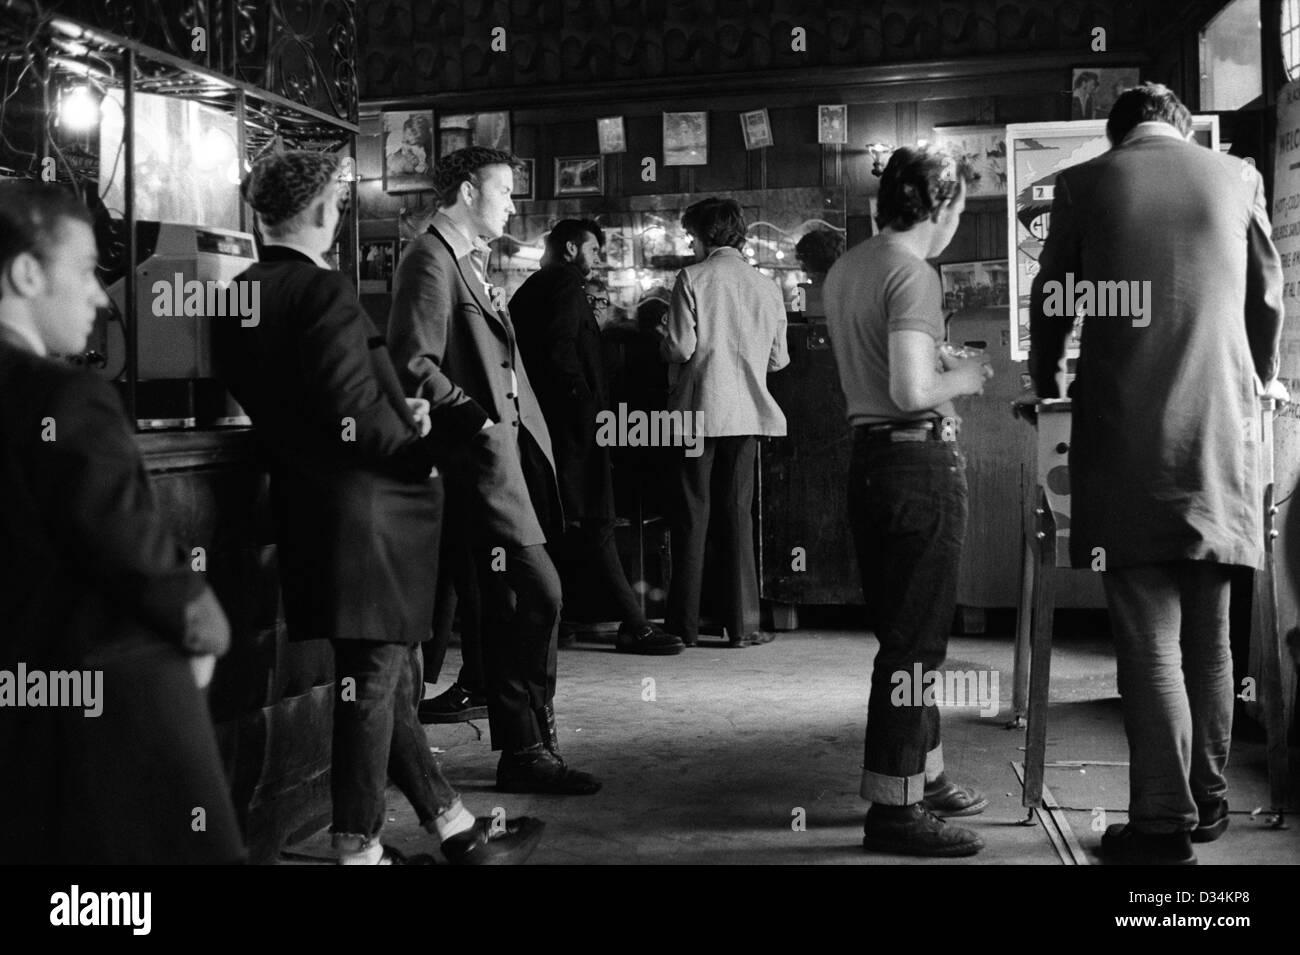 Teddy Boys wearing their distinctive drape jacket east London pub. Whitechapel London 1970s Britain. 70s UK HOMER - Stock Image